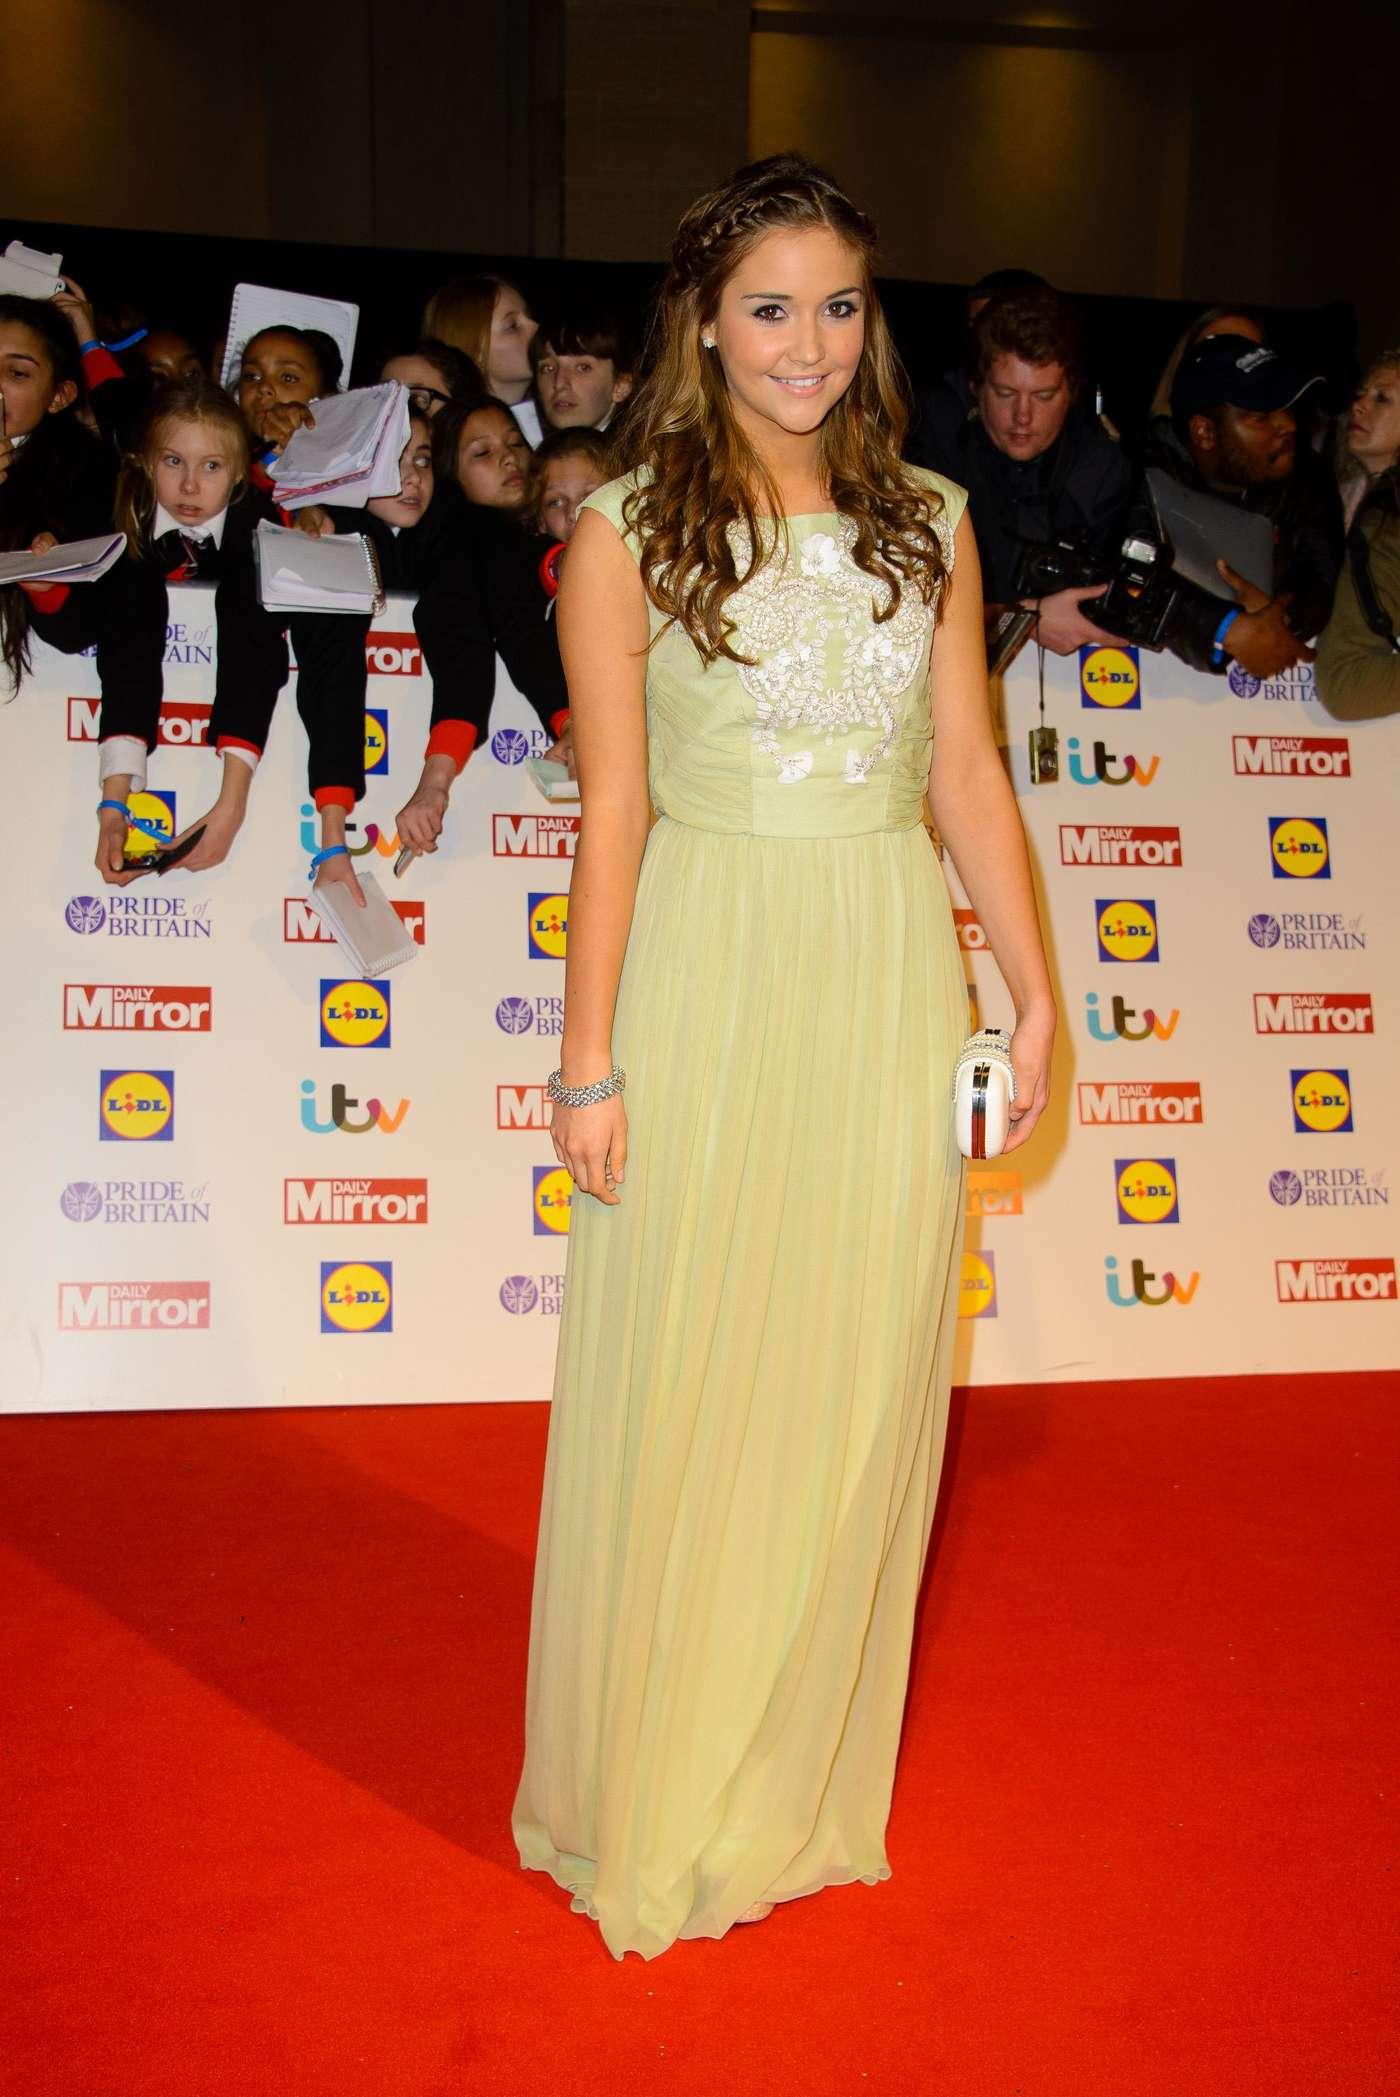 Jacqueline Jossa Pride of Britain Awards in London